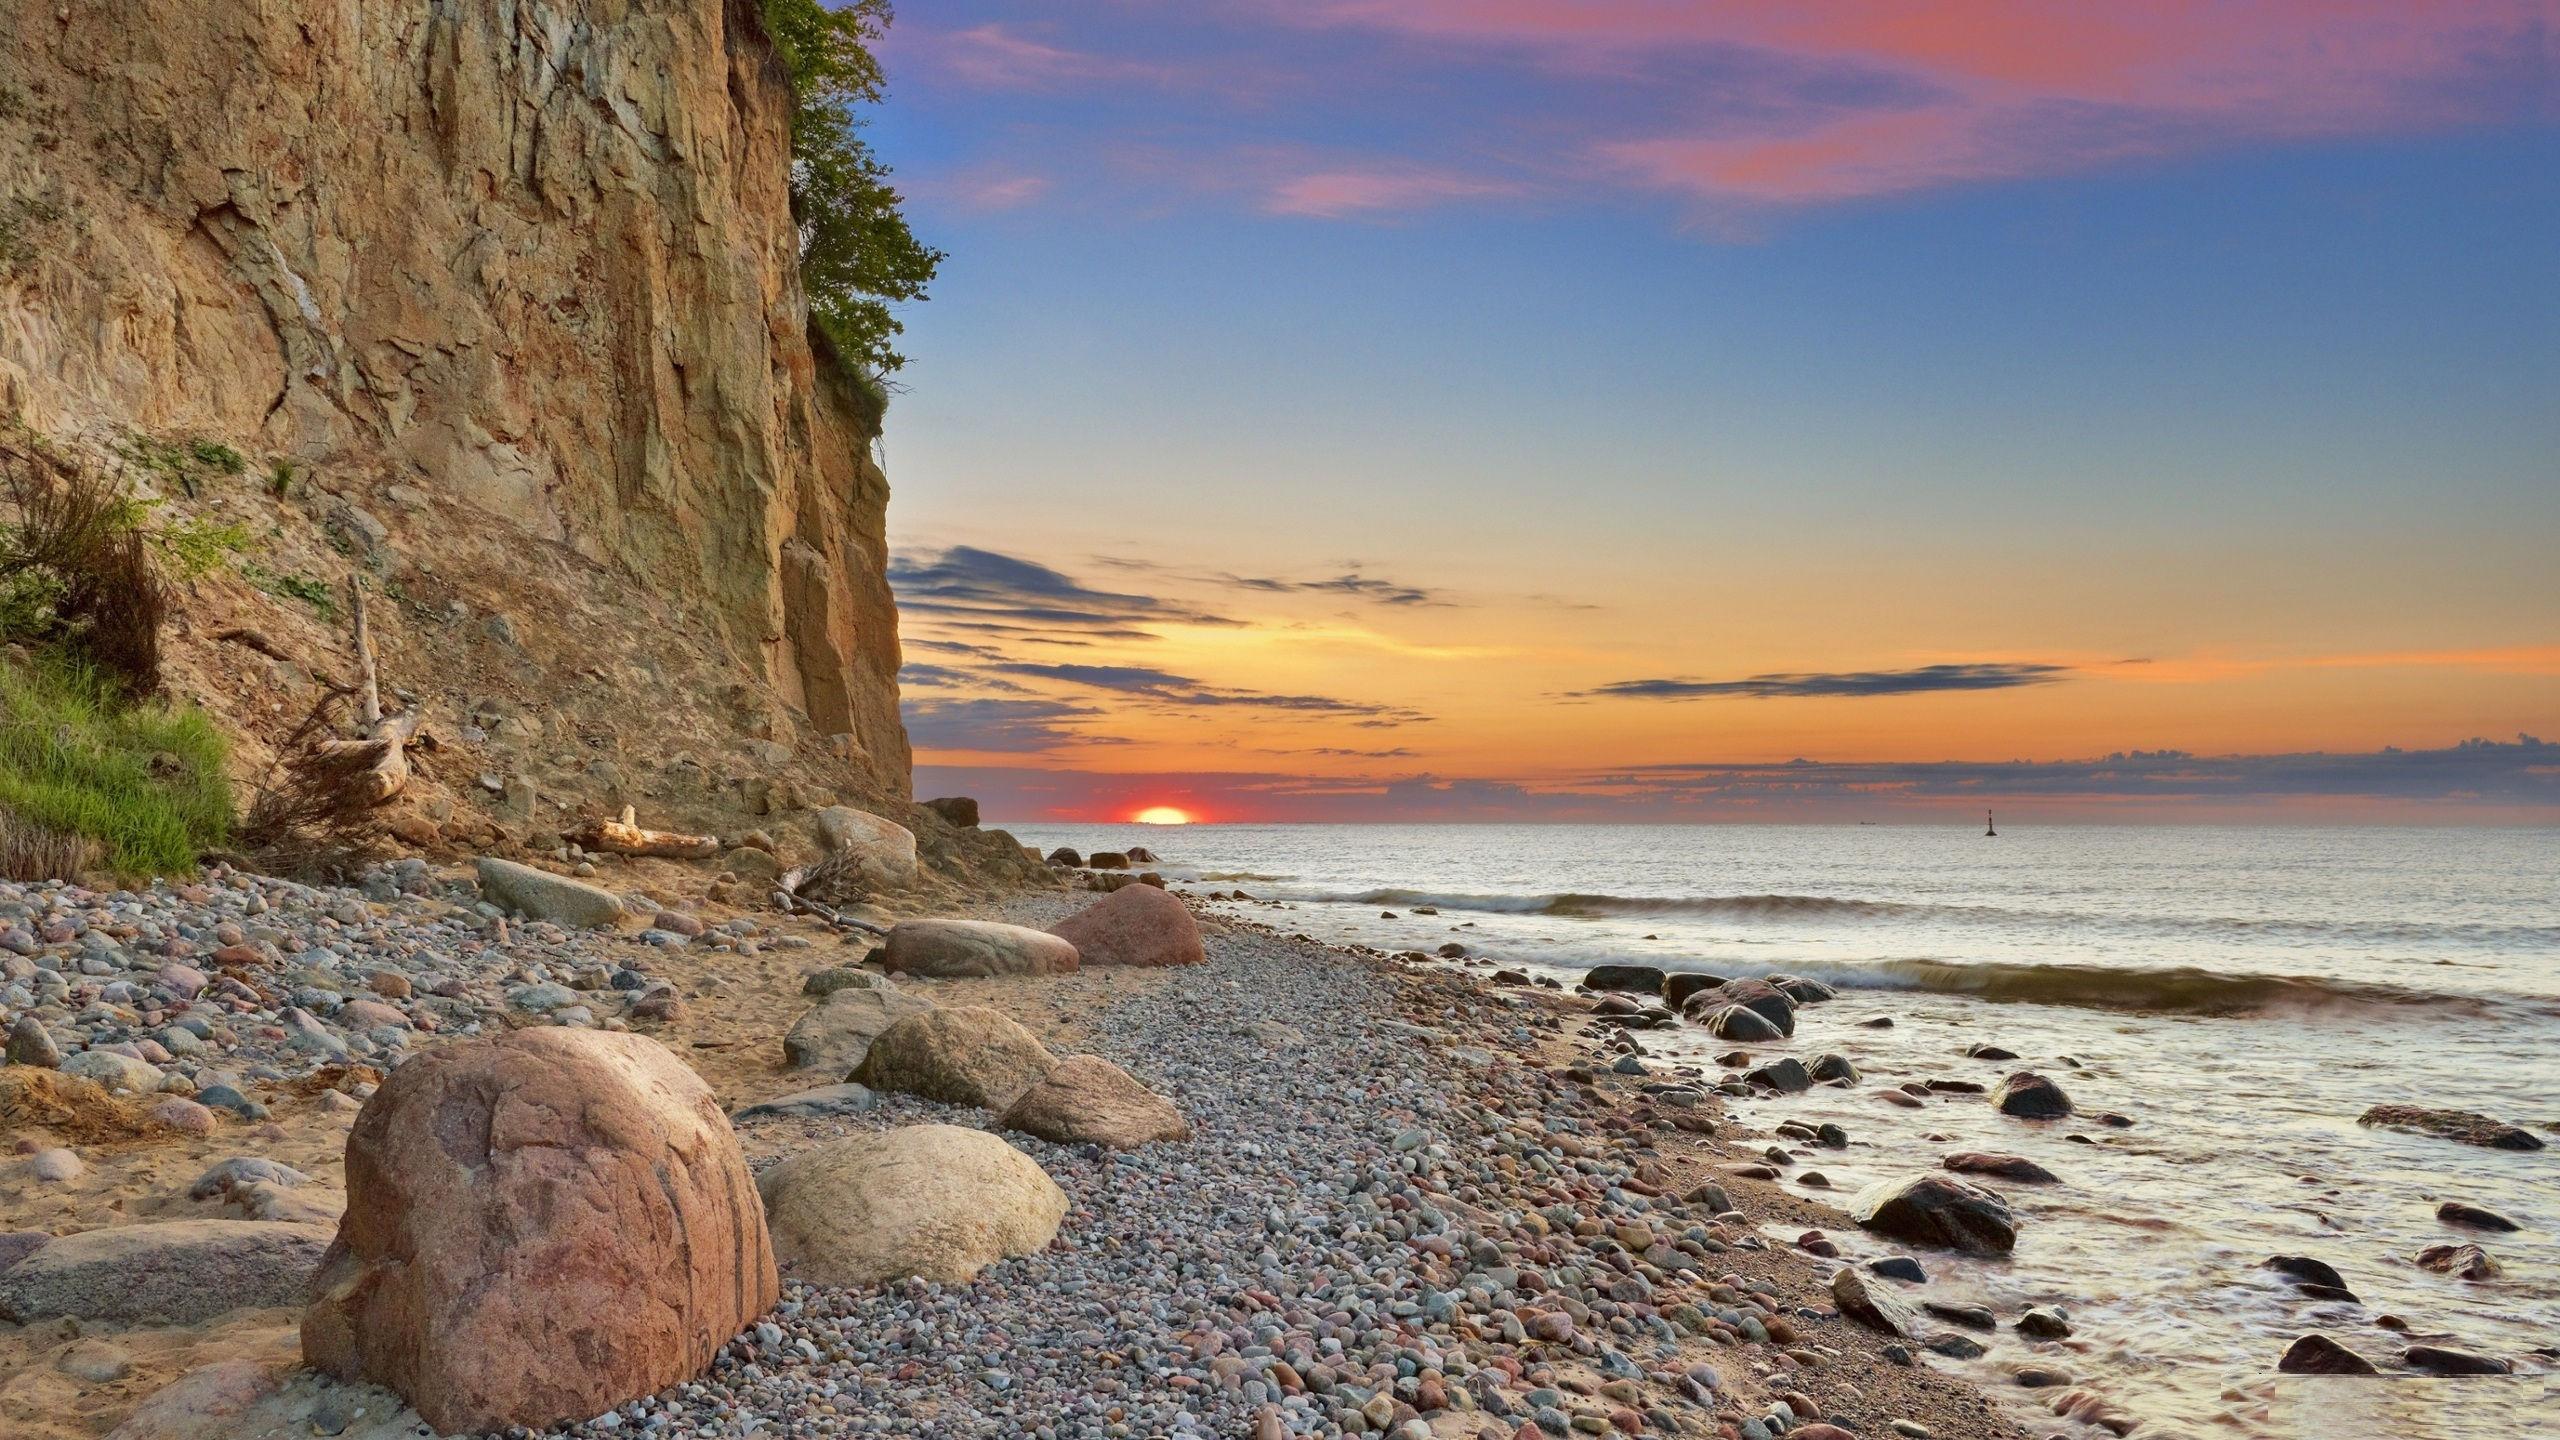 Baltic Sea HD Wallpapers - THIS Wallpaper